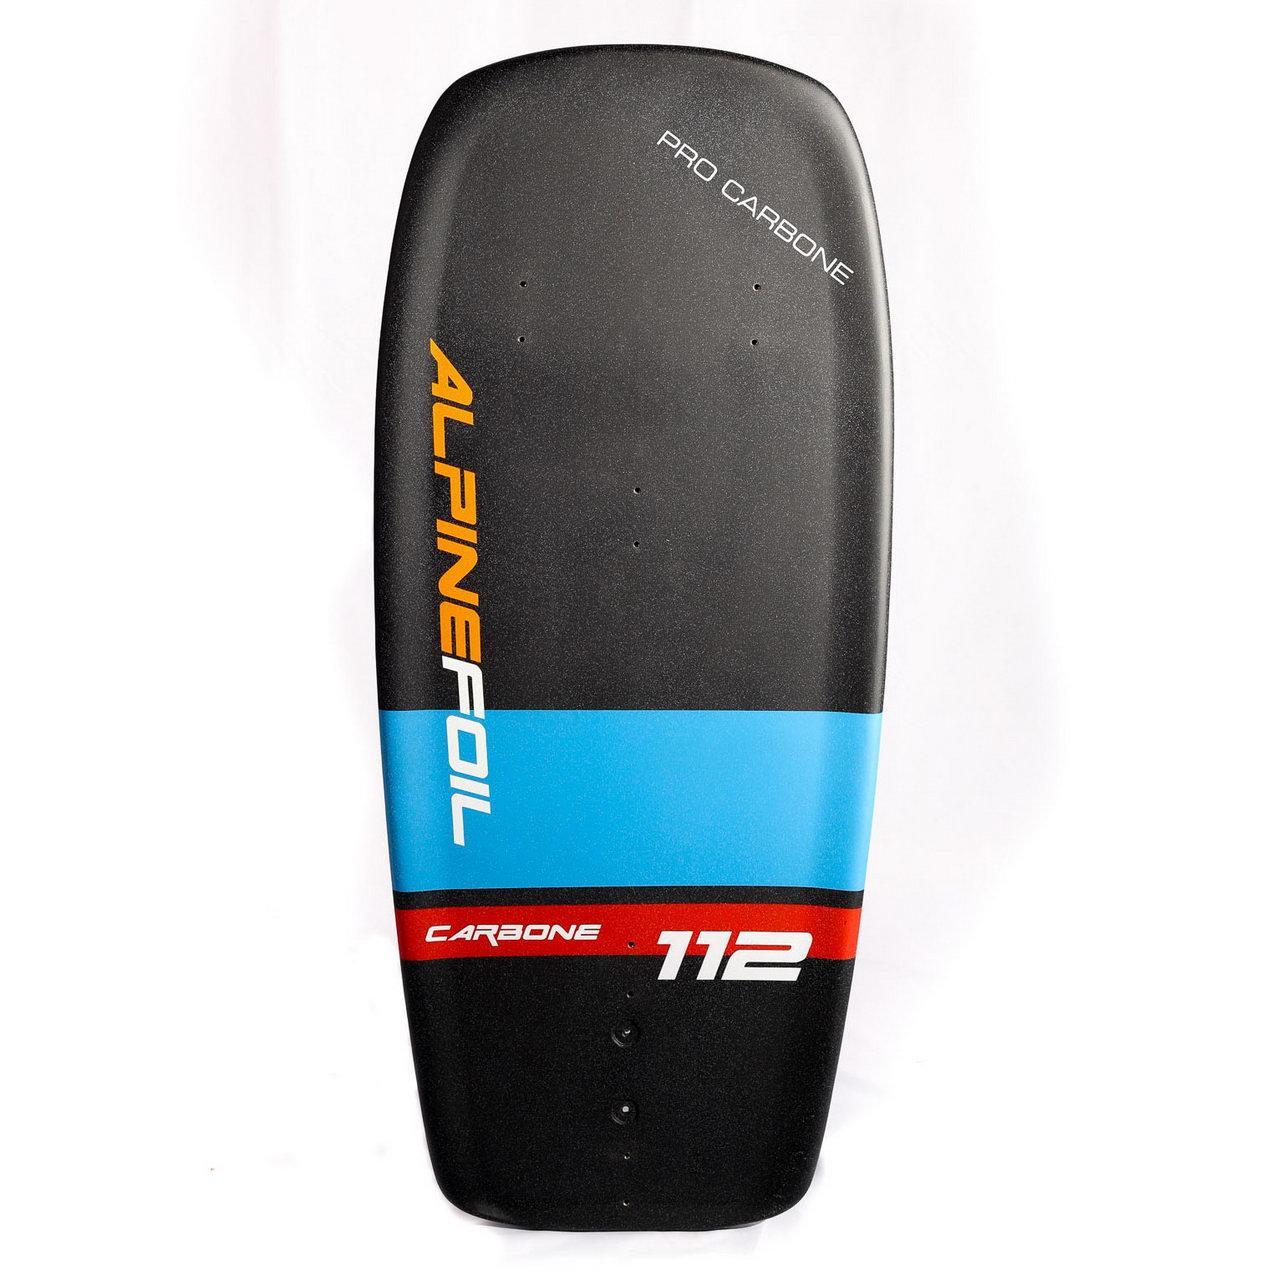 Alpinefoil pocket pro carbon 112x47 3265 1 1 redimensionner